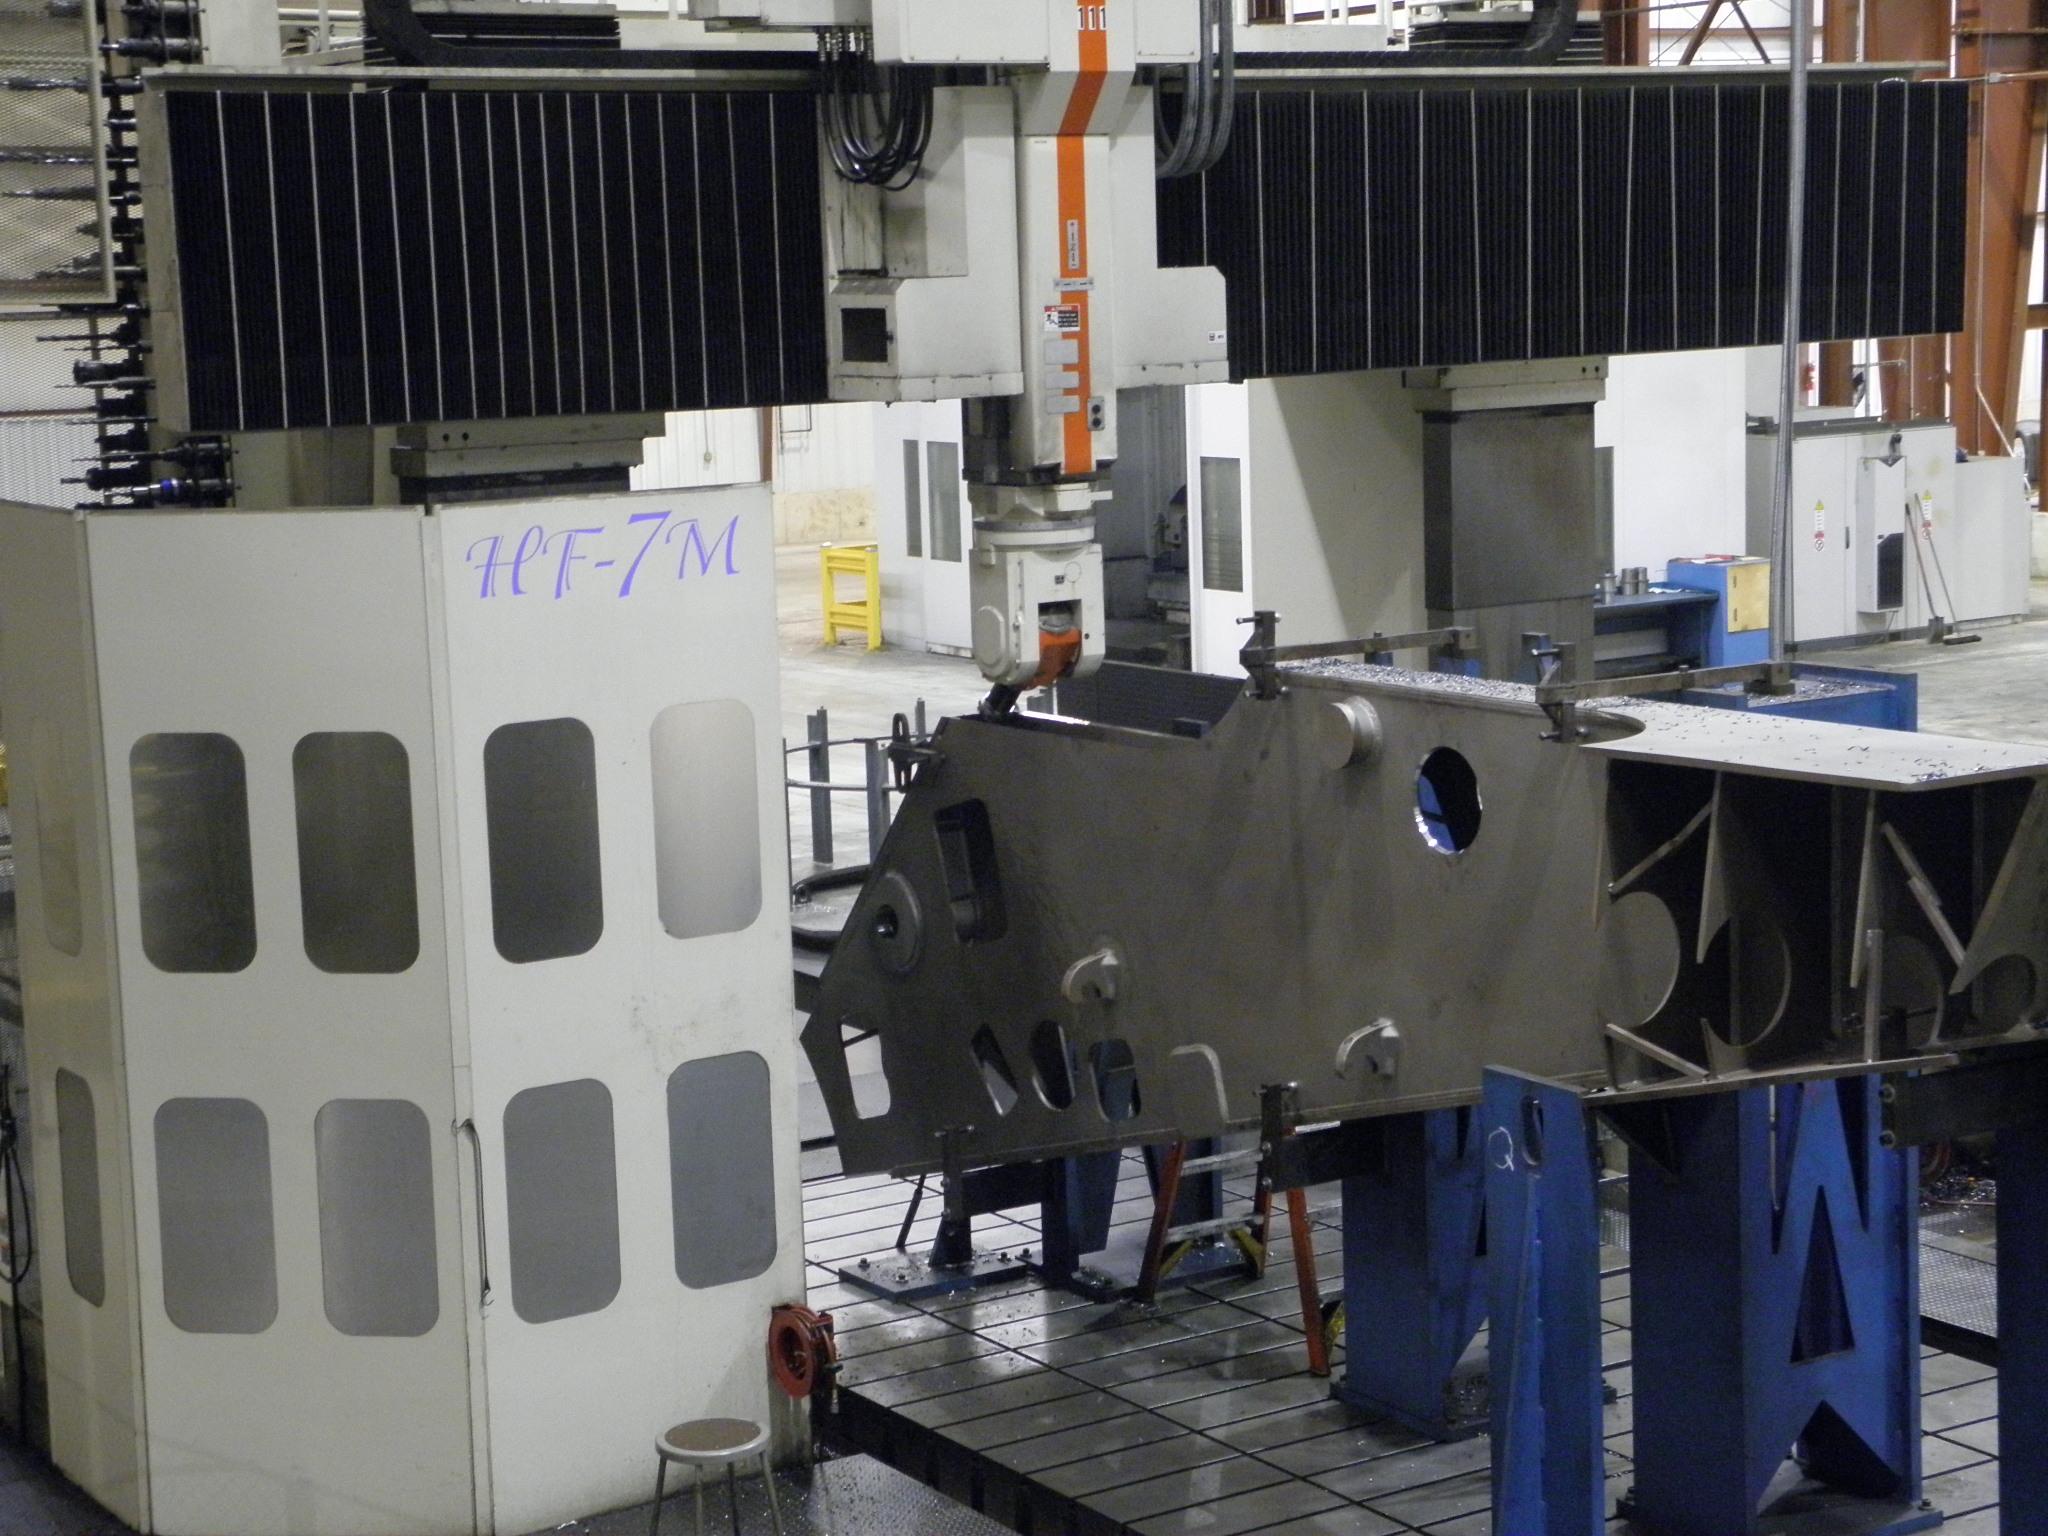 Large Machining SNK HF-7VM Vertical Gantry Mill Universal Head